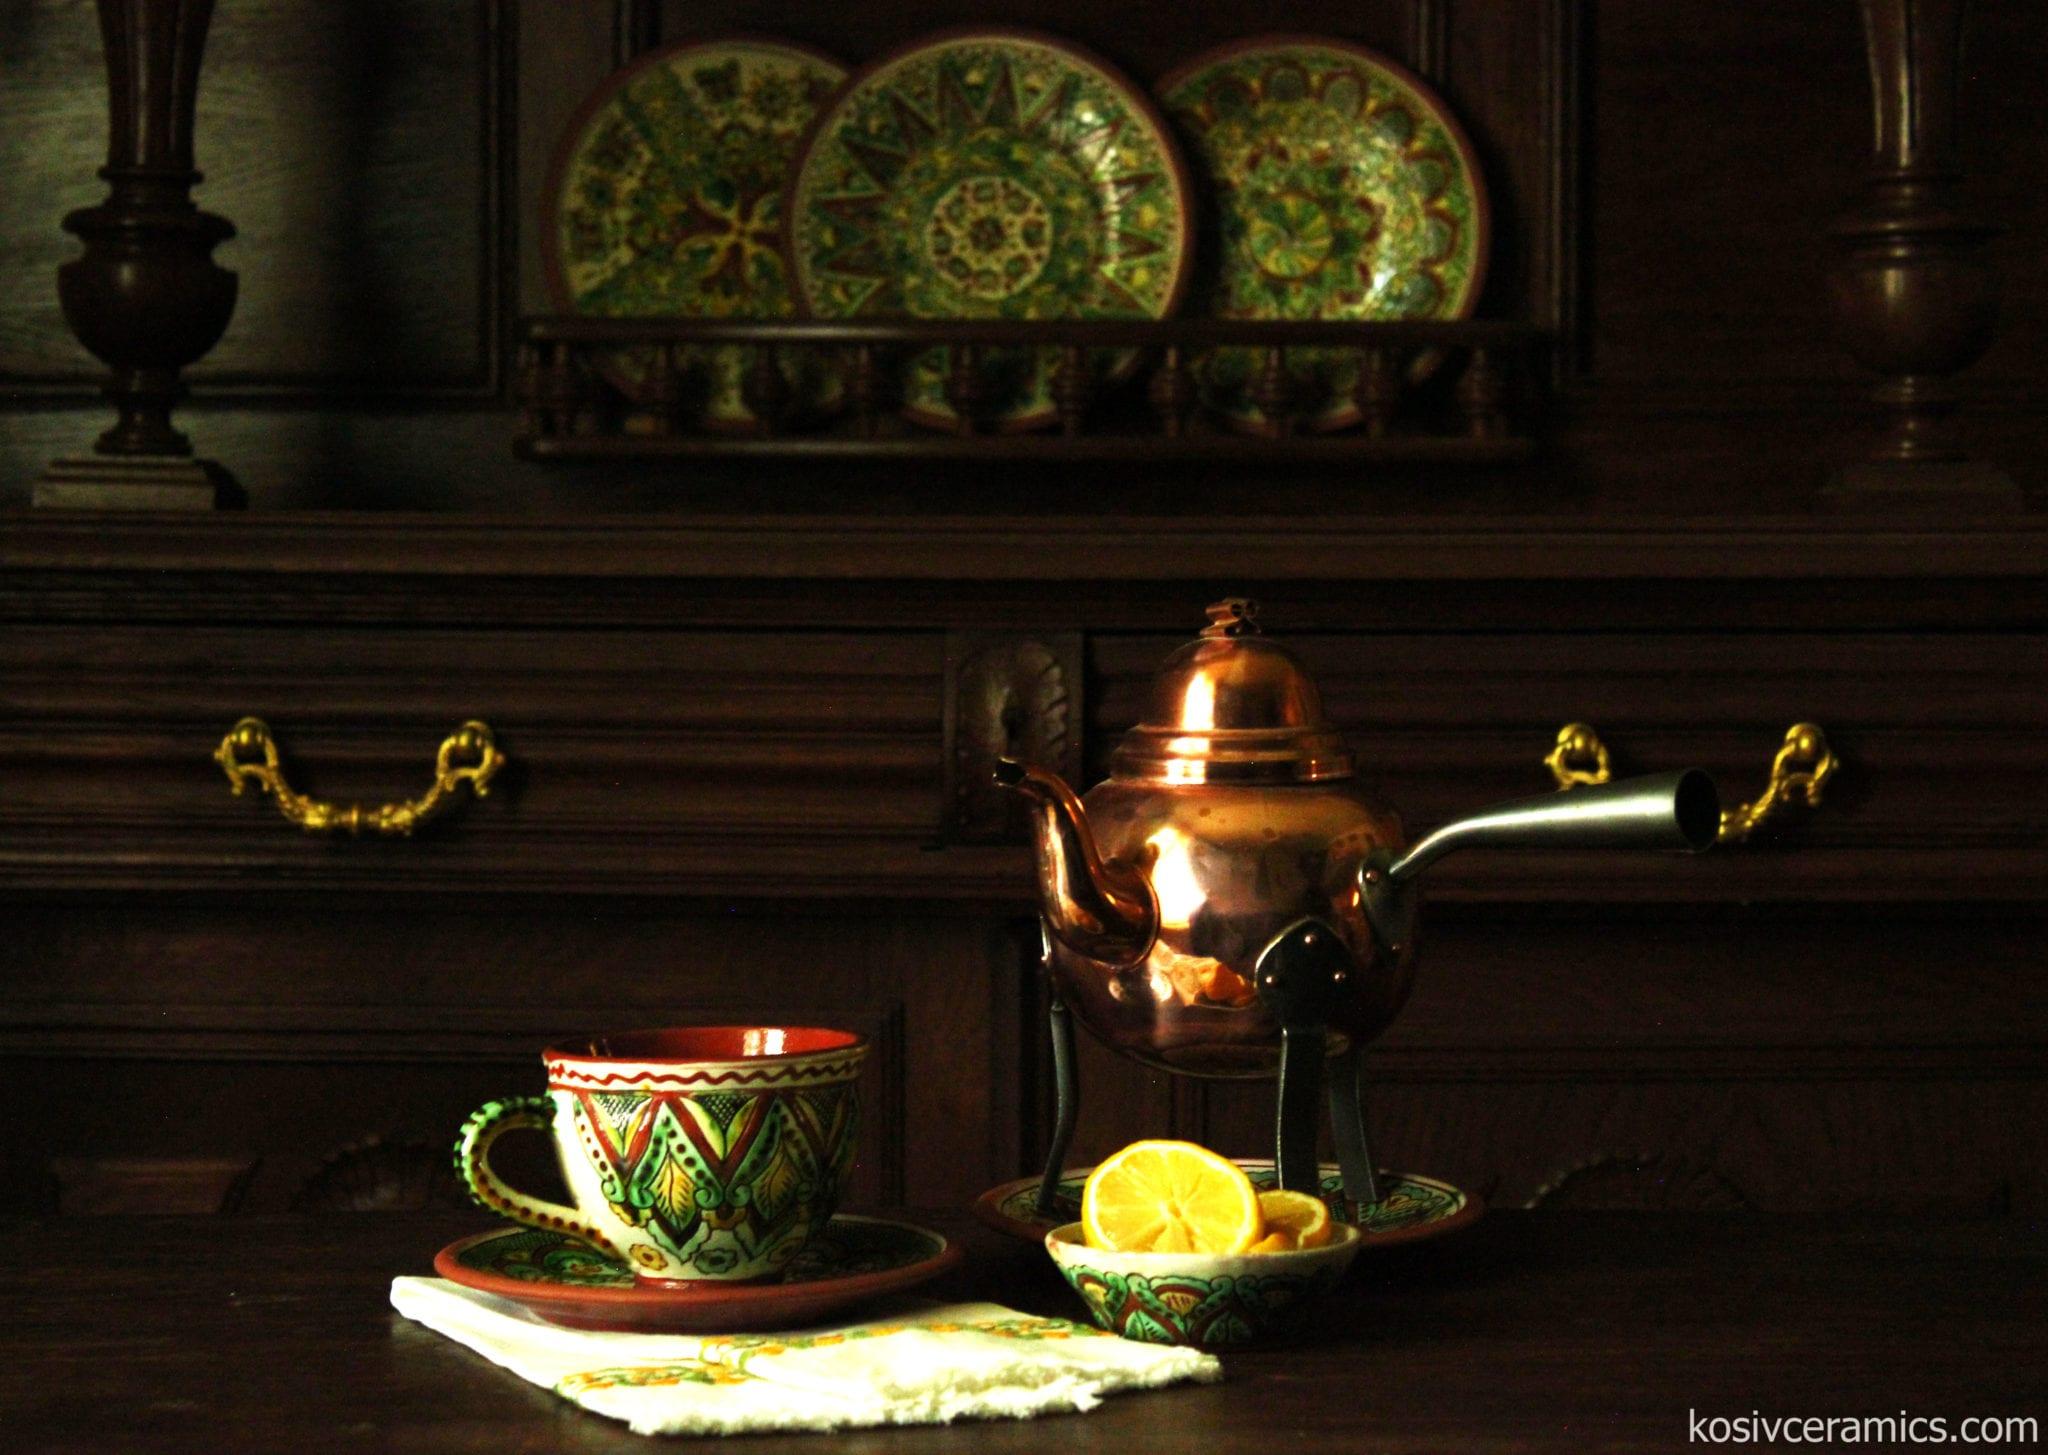 slow living, кераміка, ручна робота, кераміка ручної роботи, троць, косівська кераміка, гуцульська кераміка, кераміка троць, kosiv ceramics, sgraffito, ceramics